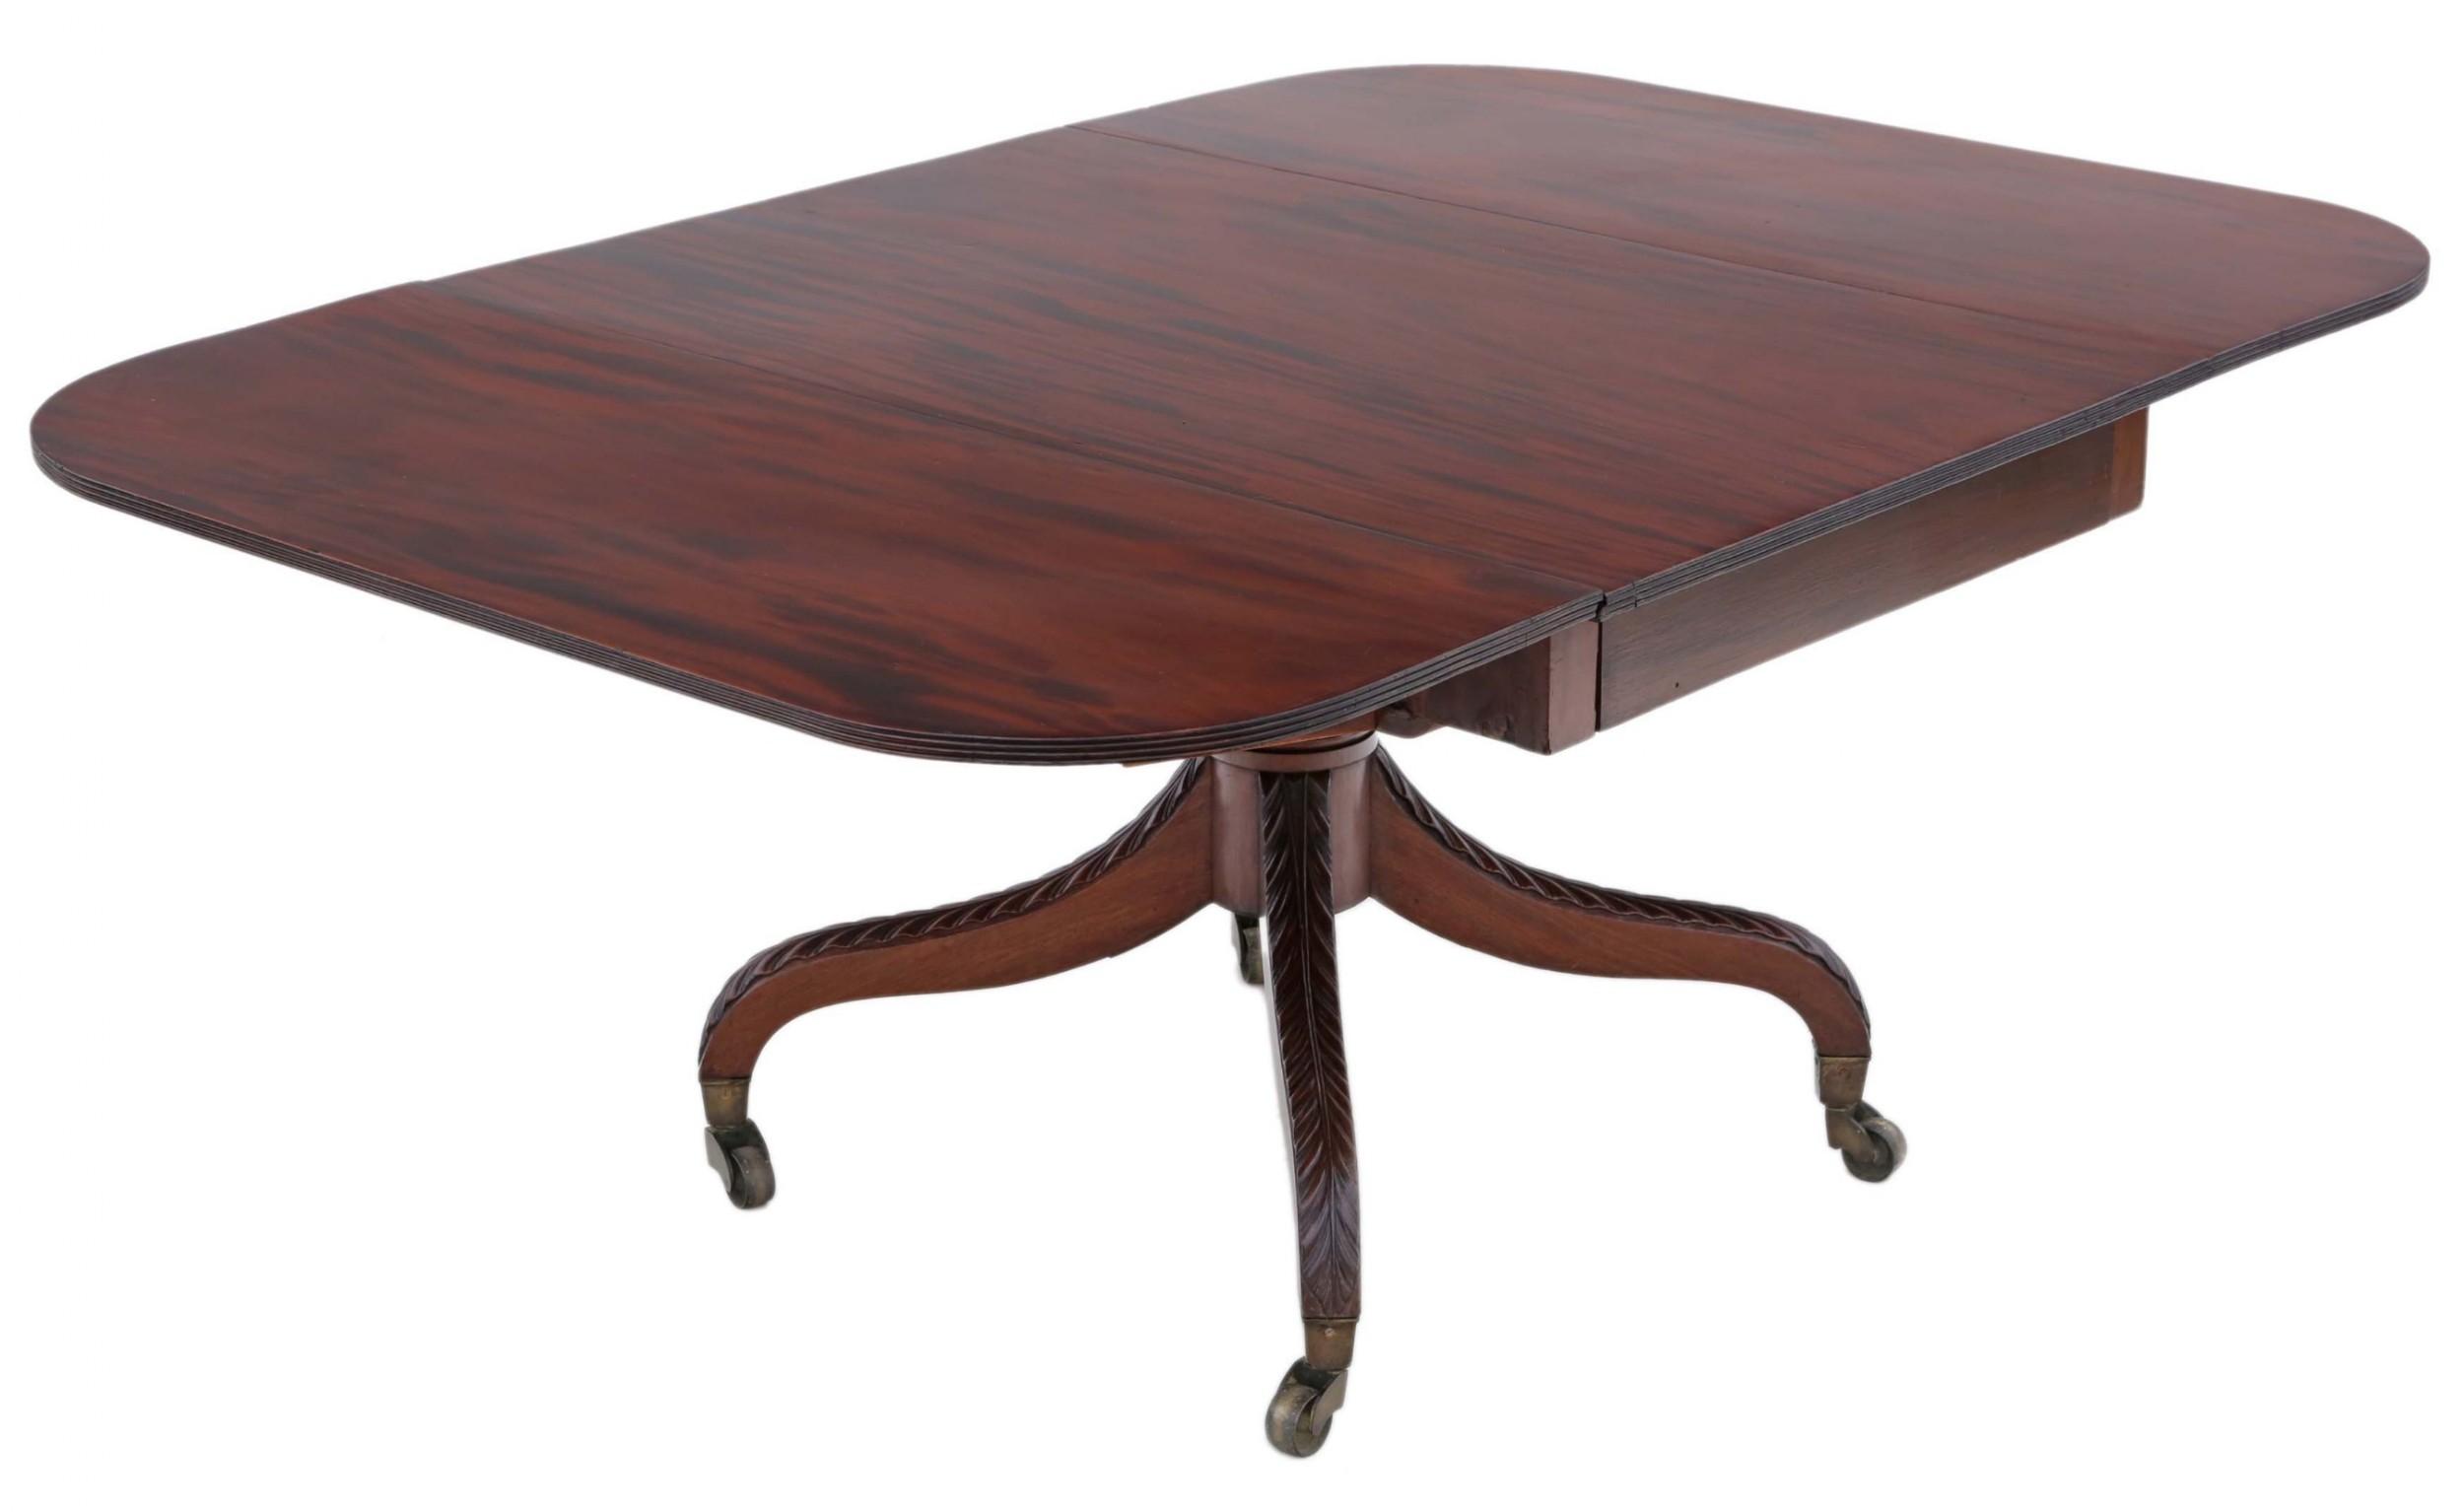 regency c1825 cuban mahogany drop leaf dining table